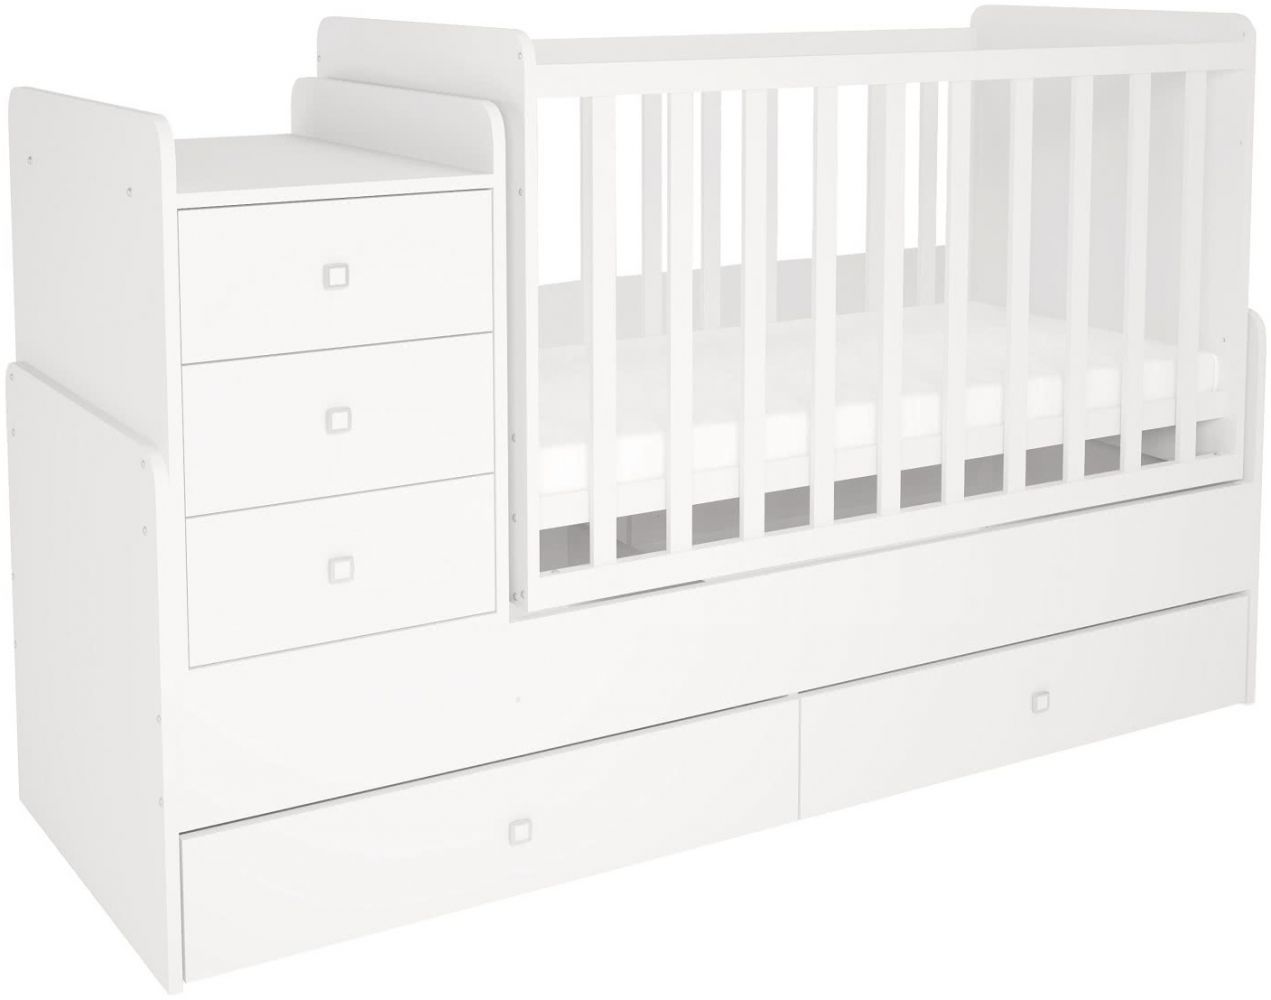 Polini Kids 'Simple 1100' Kombi-Kinderbett 60 x 120/170 cm, weiß, höhenverstellbar, mit Schaukelfunktion, inkl. Kommode Bild 1